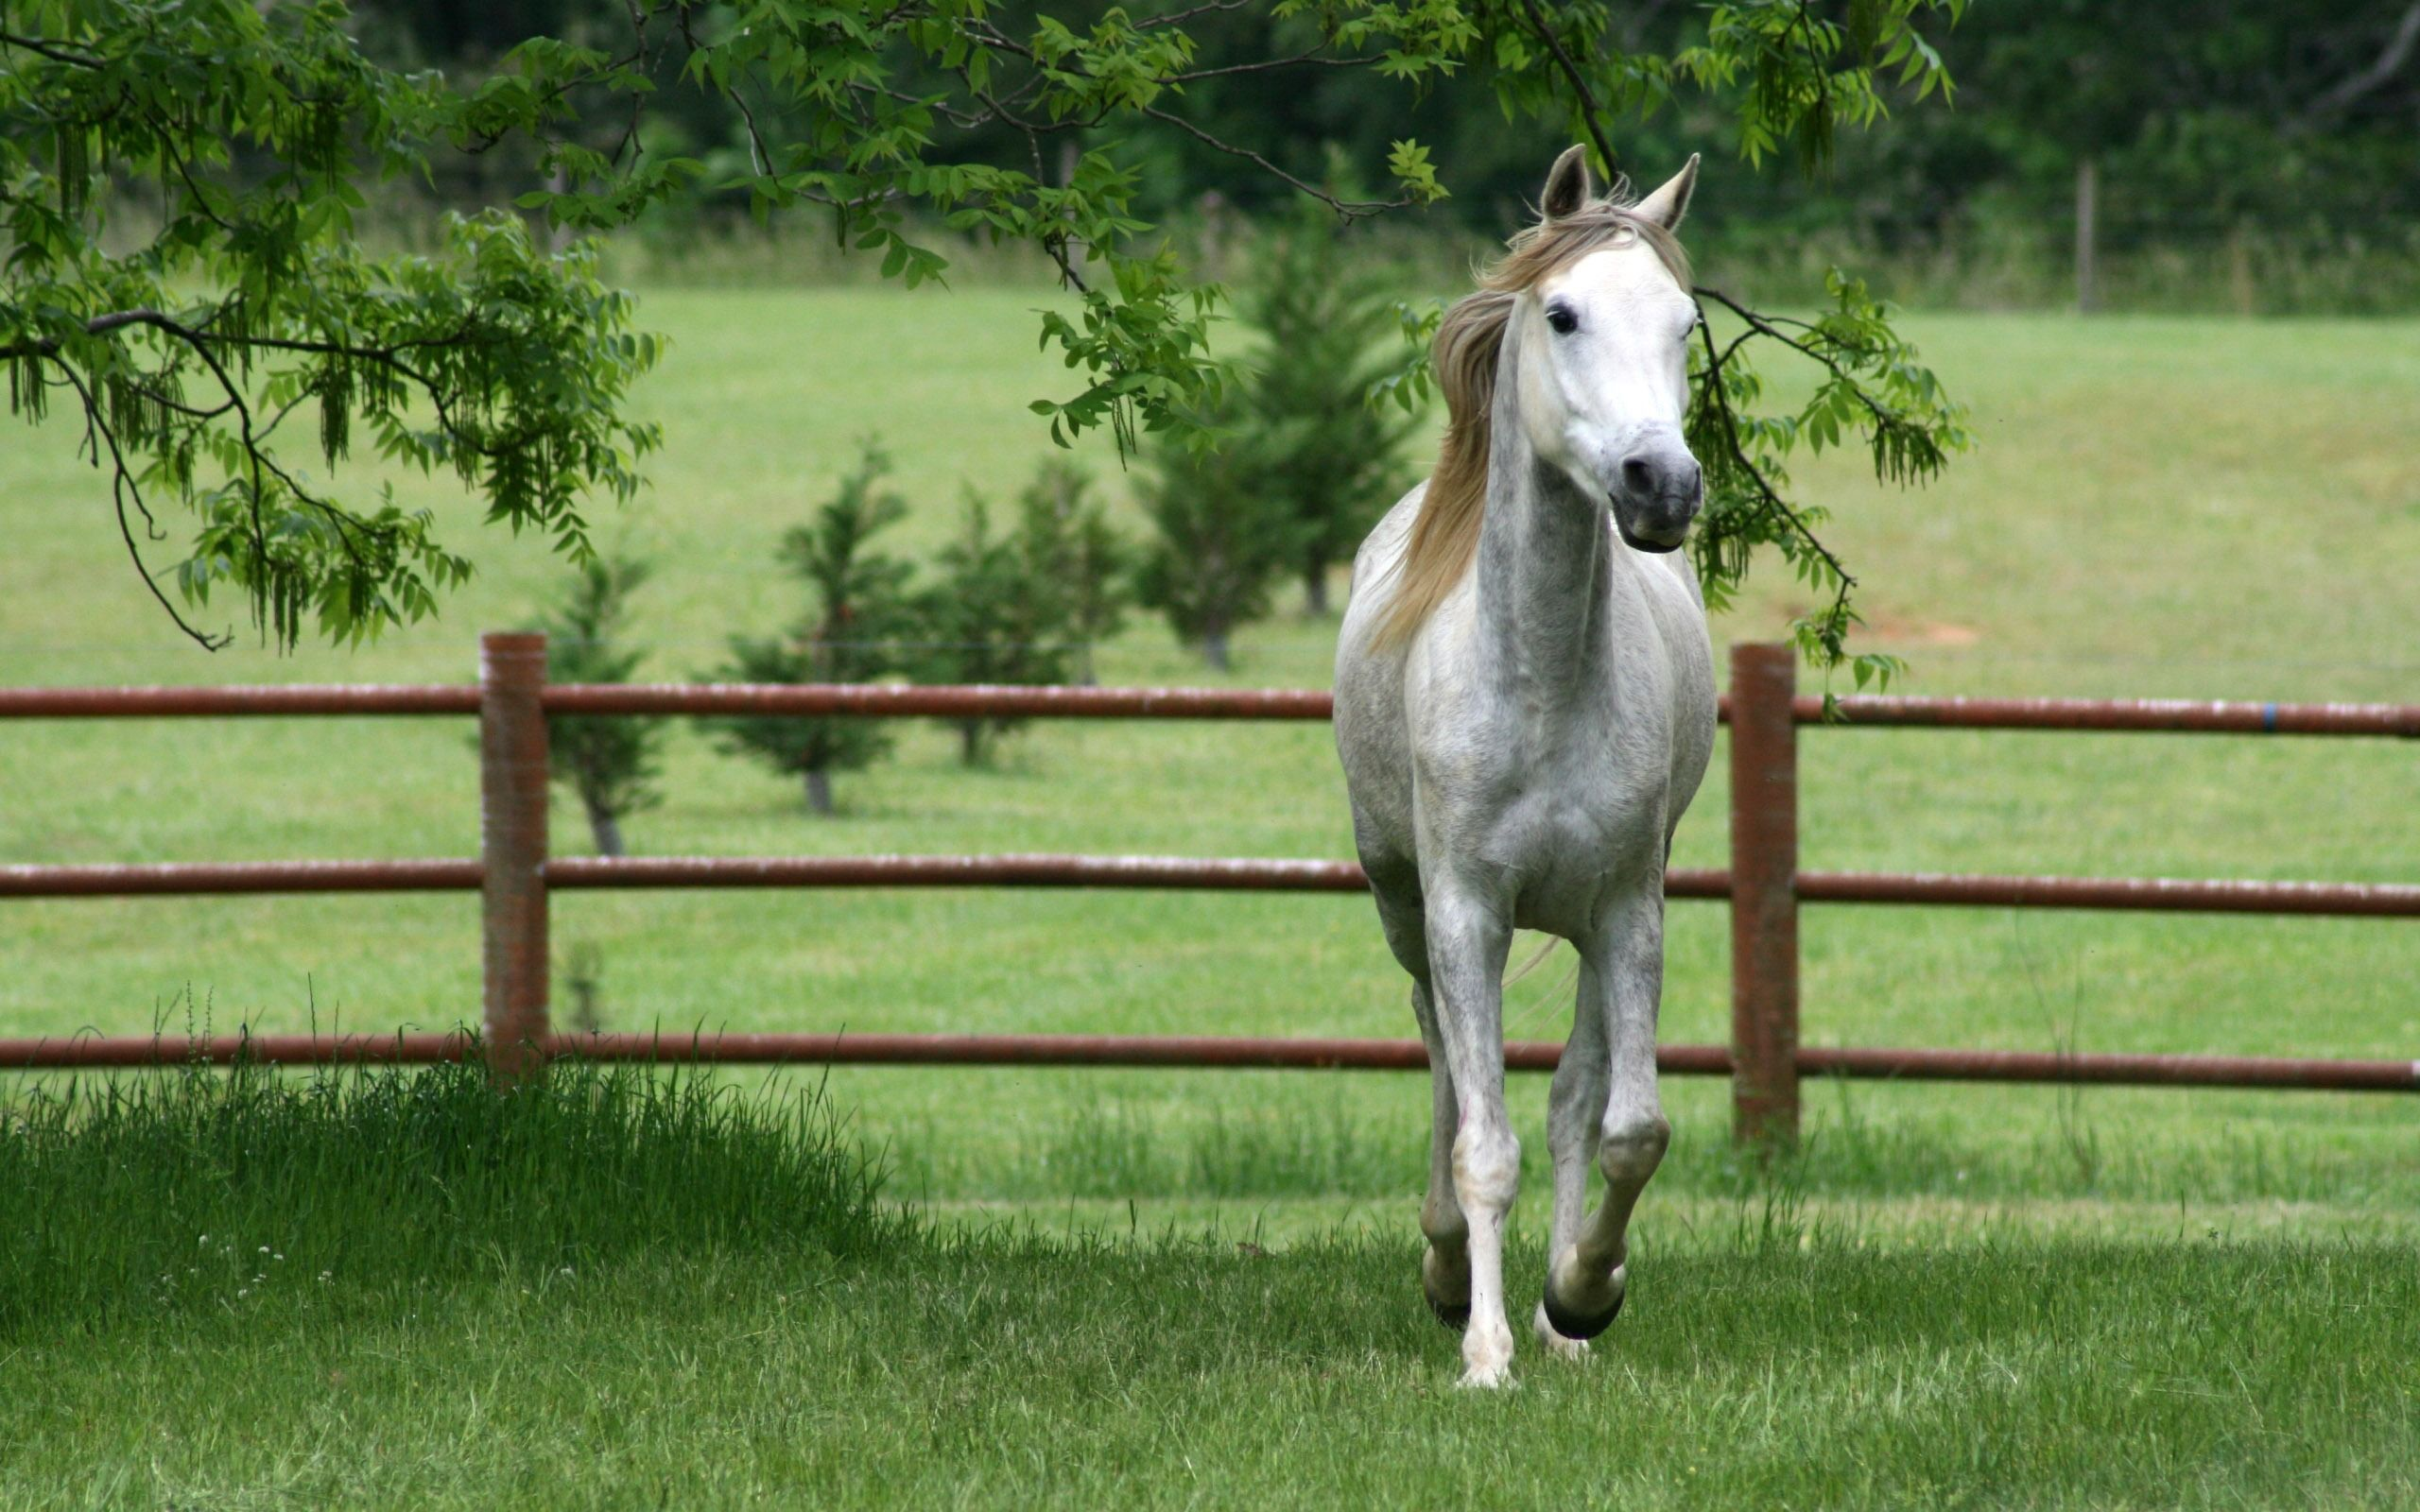 horse images wallpaper